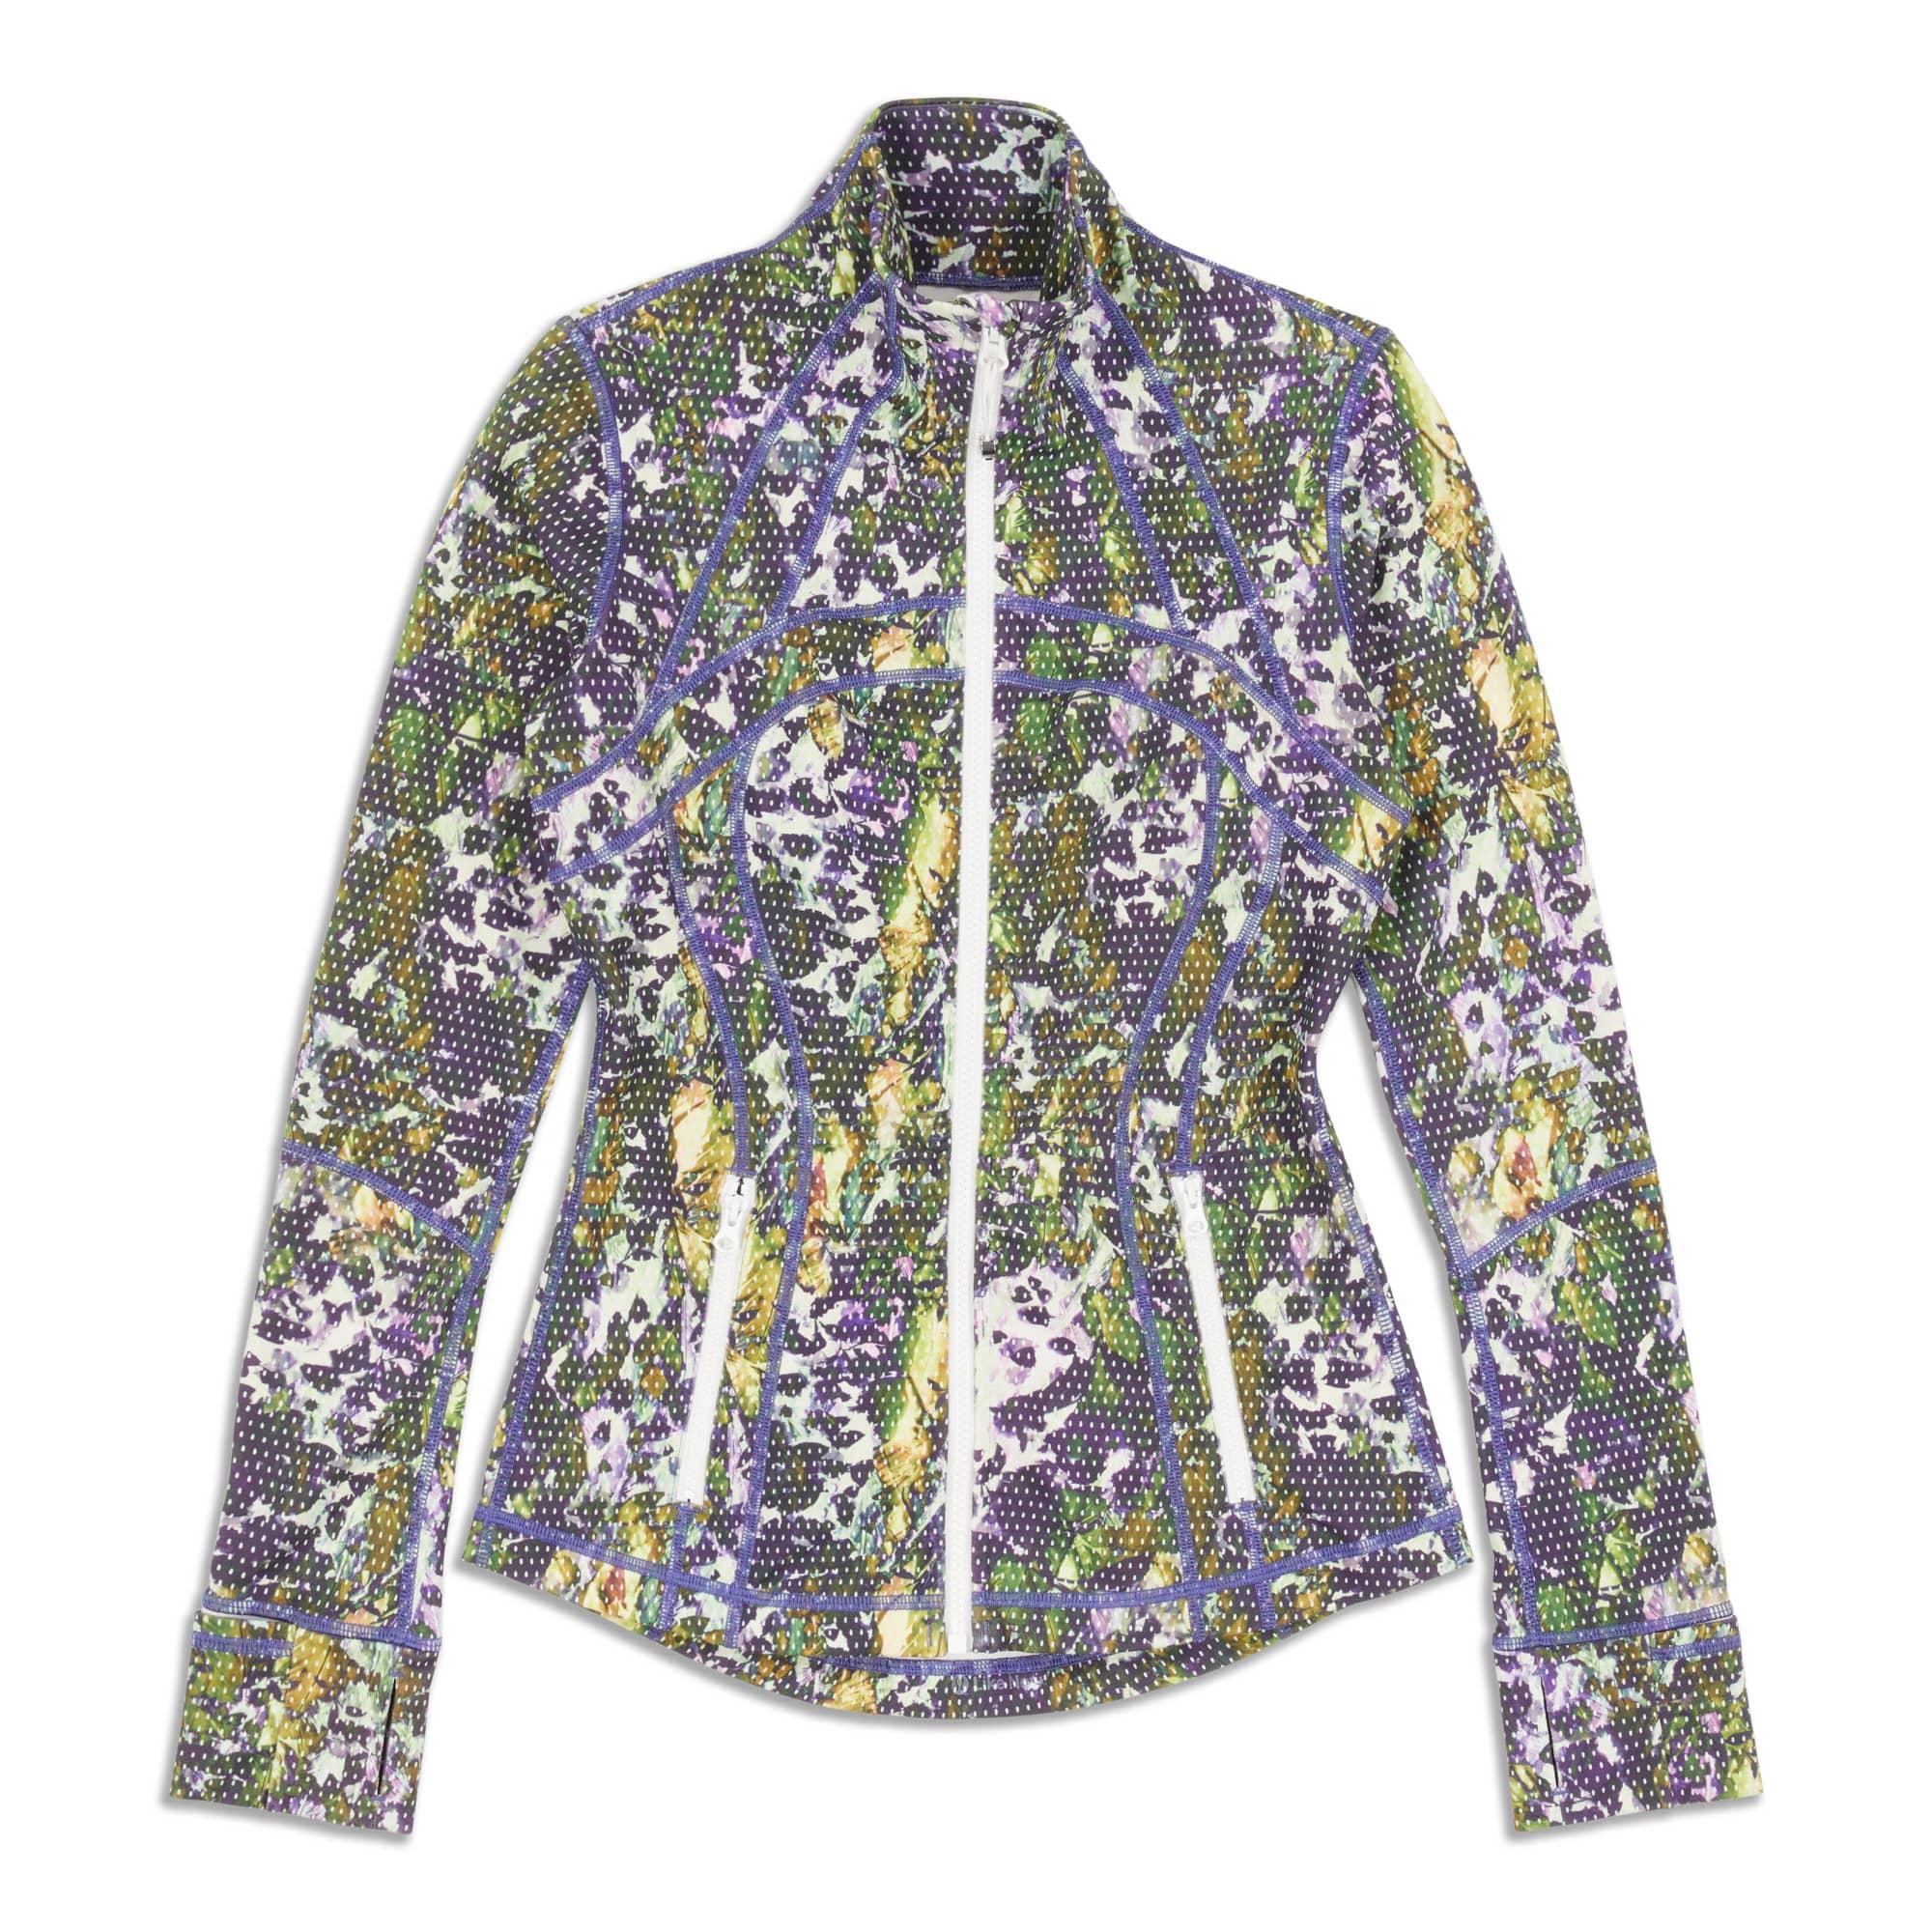 Main product image: Define Jacket - Resale